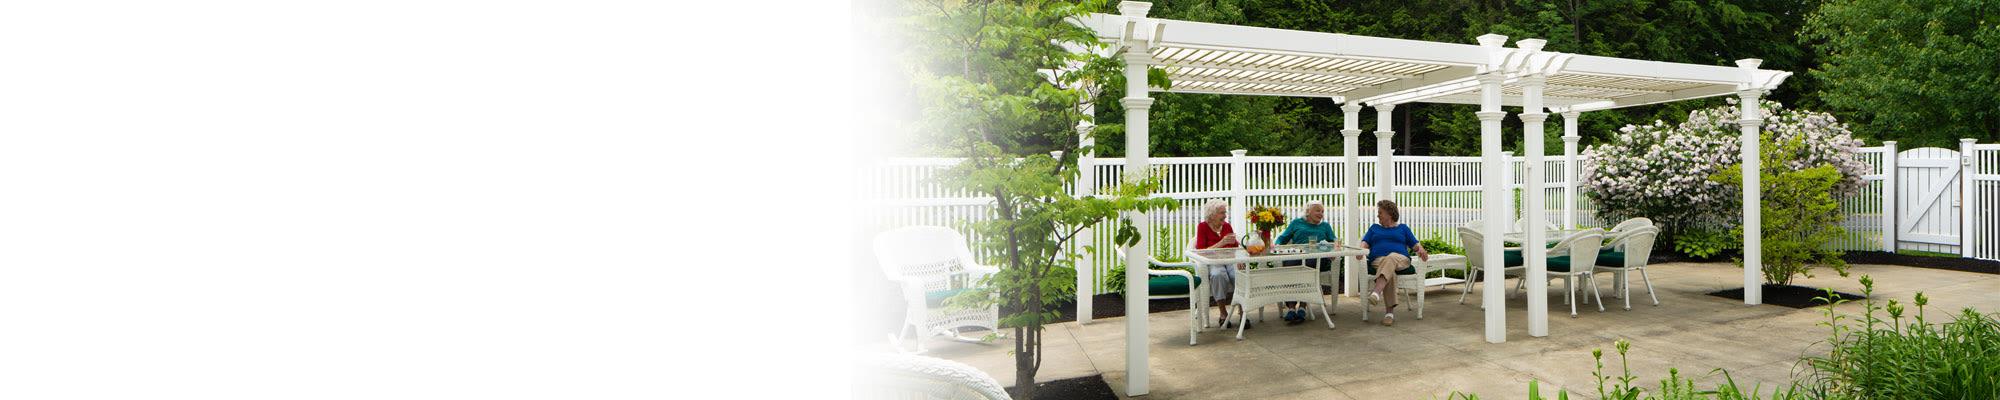 Photos of Wheelock Terrace in Hanover, New Hampshire